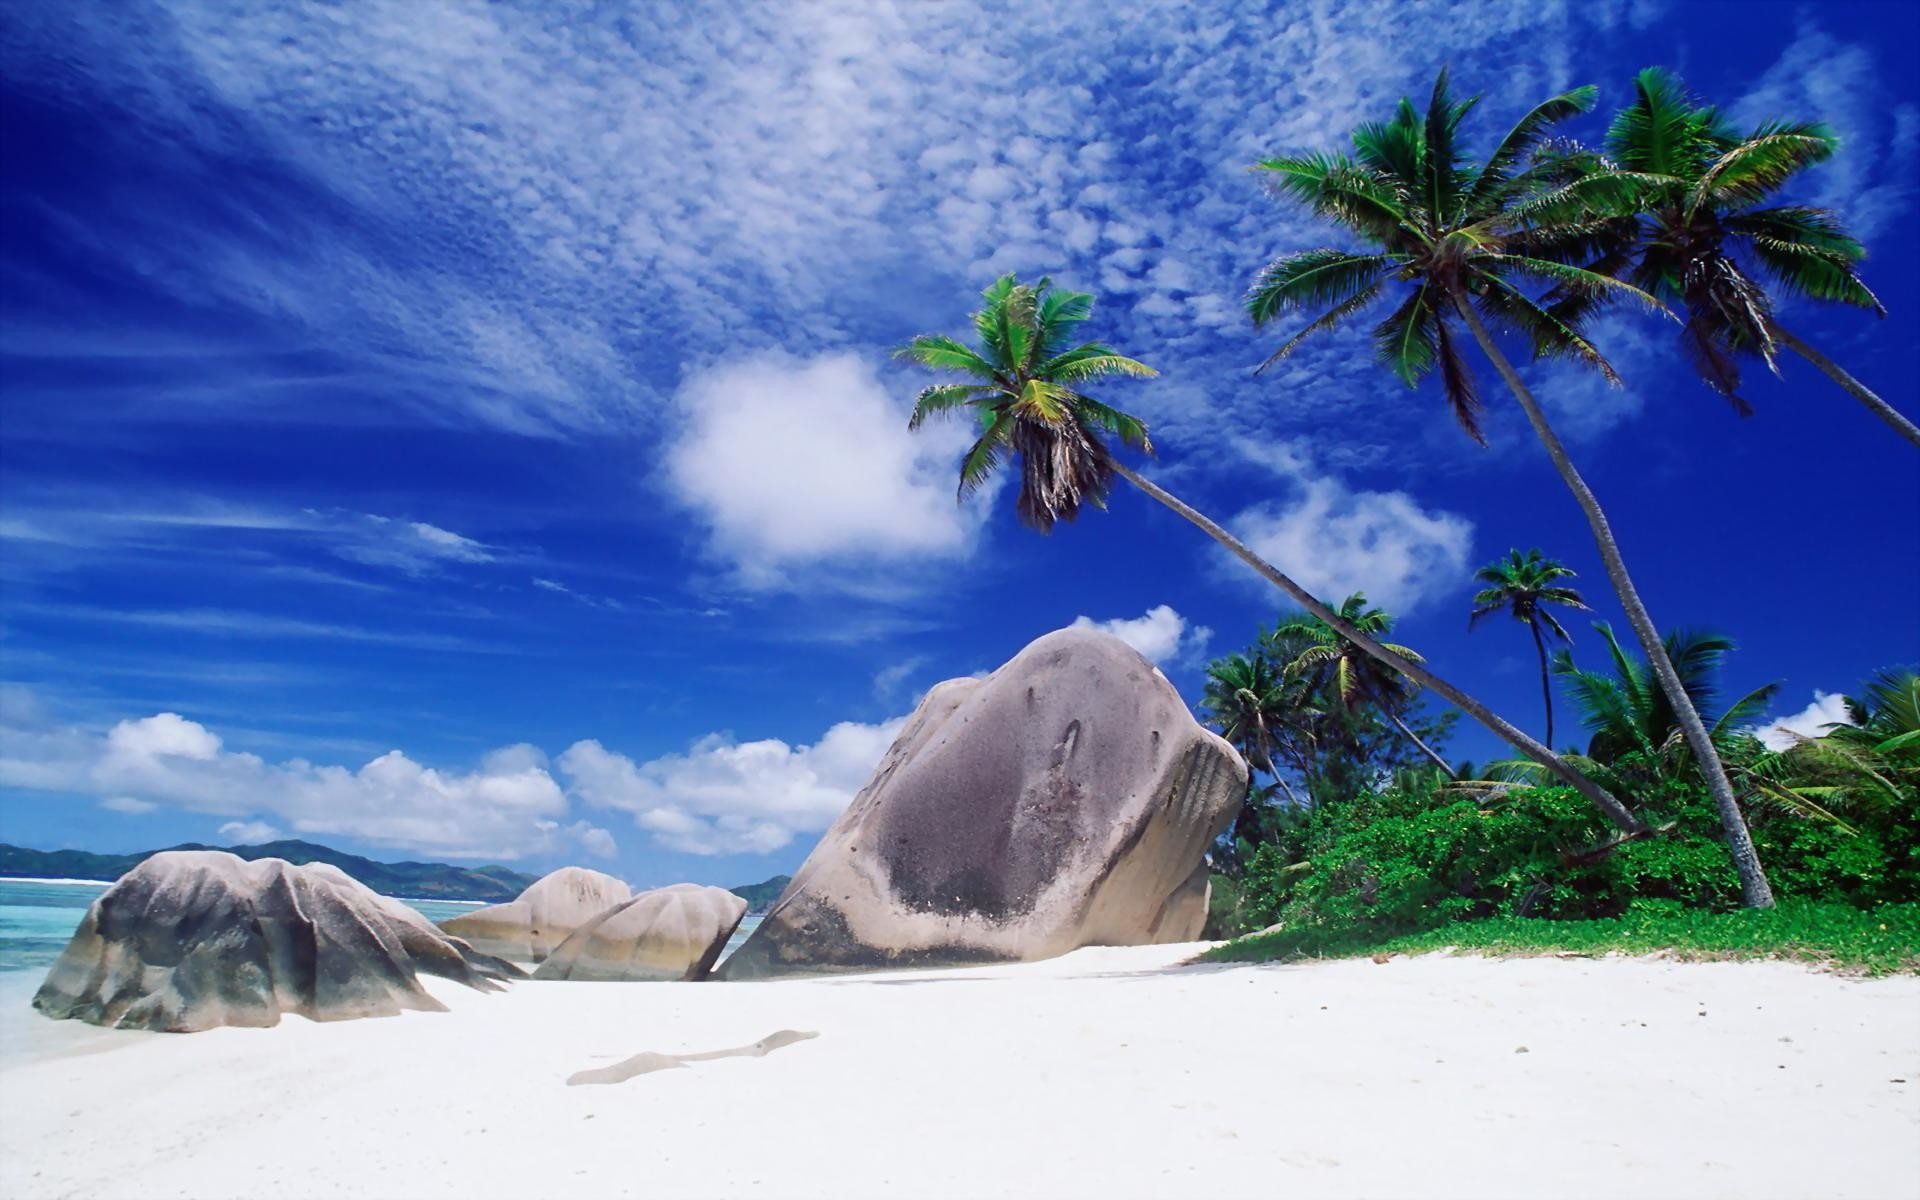 beautiful beach nature image